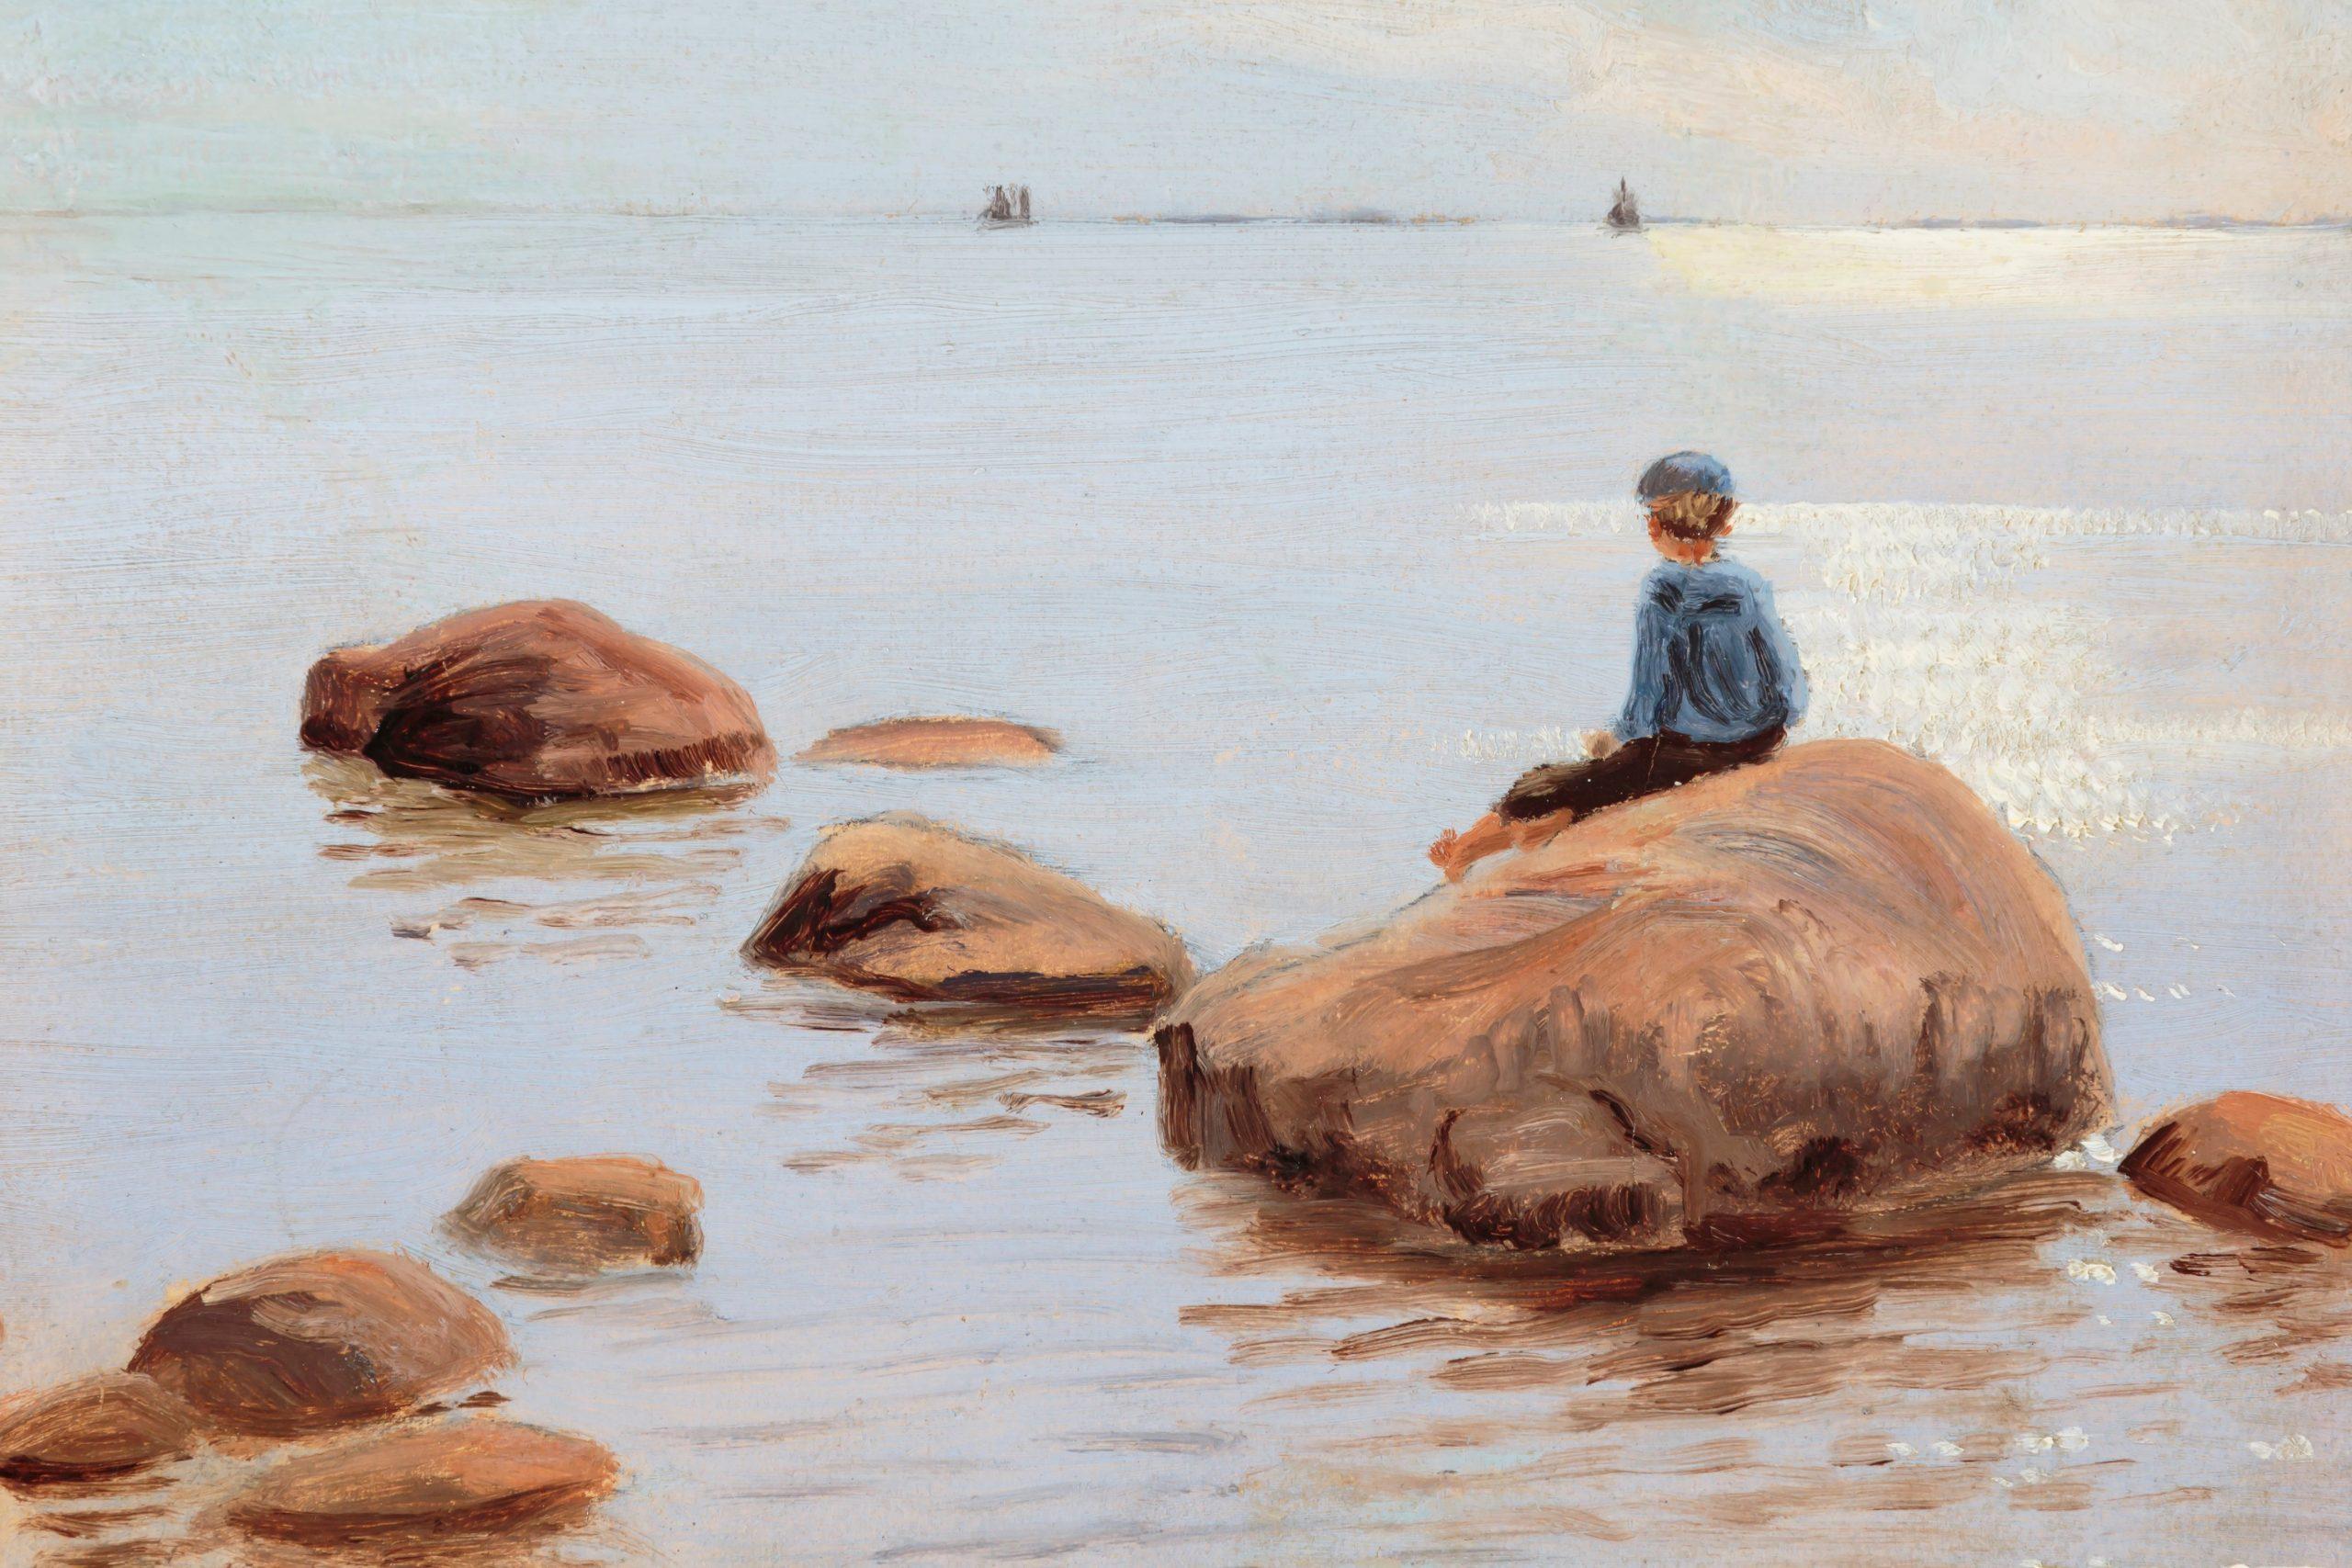 Kirpilä Art Collection is open throughout the summer